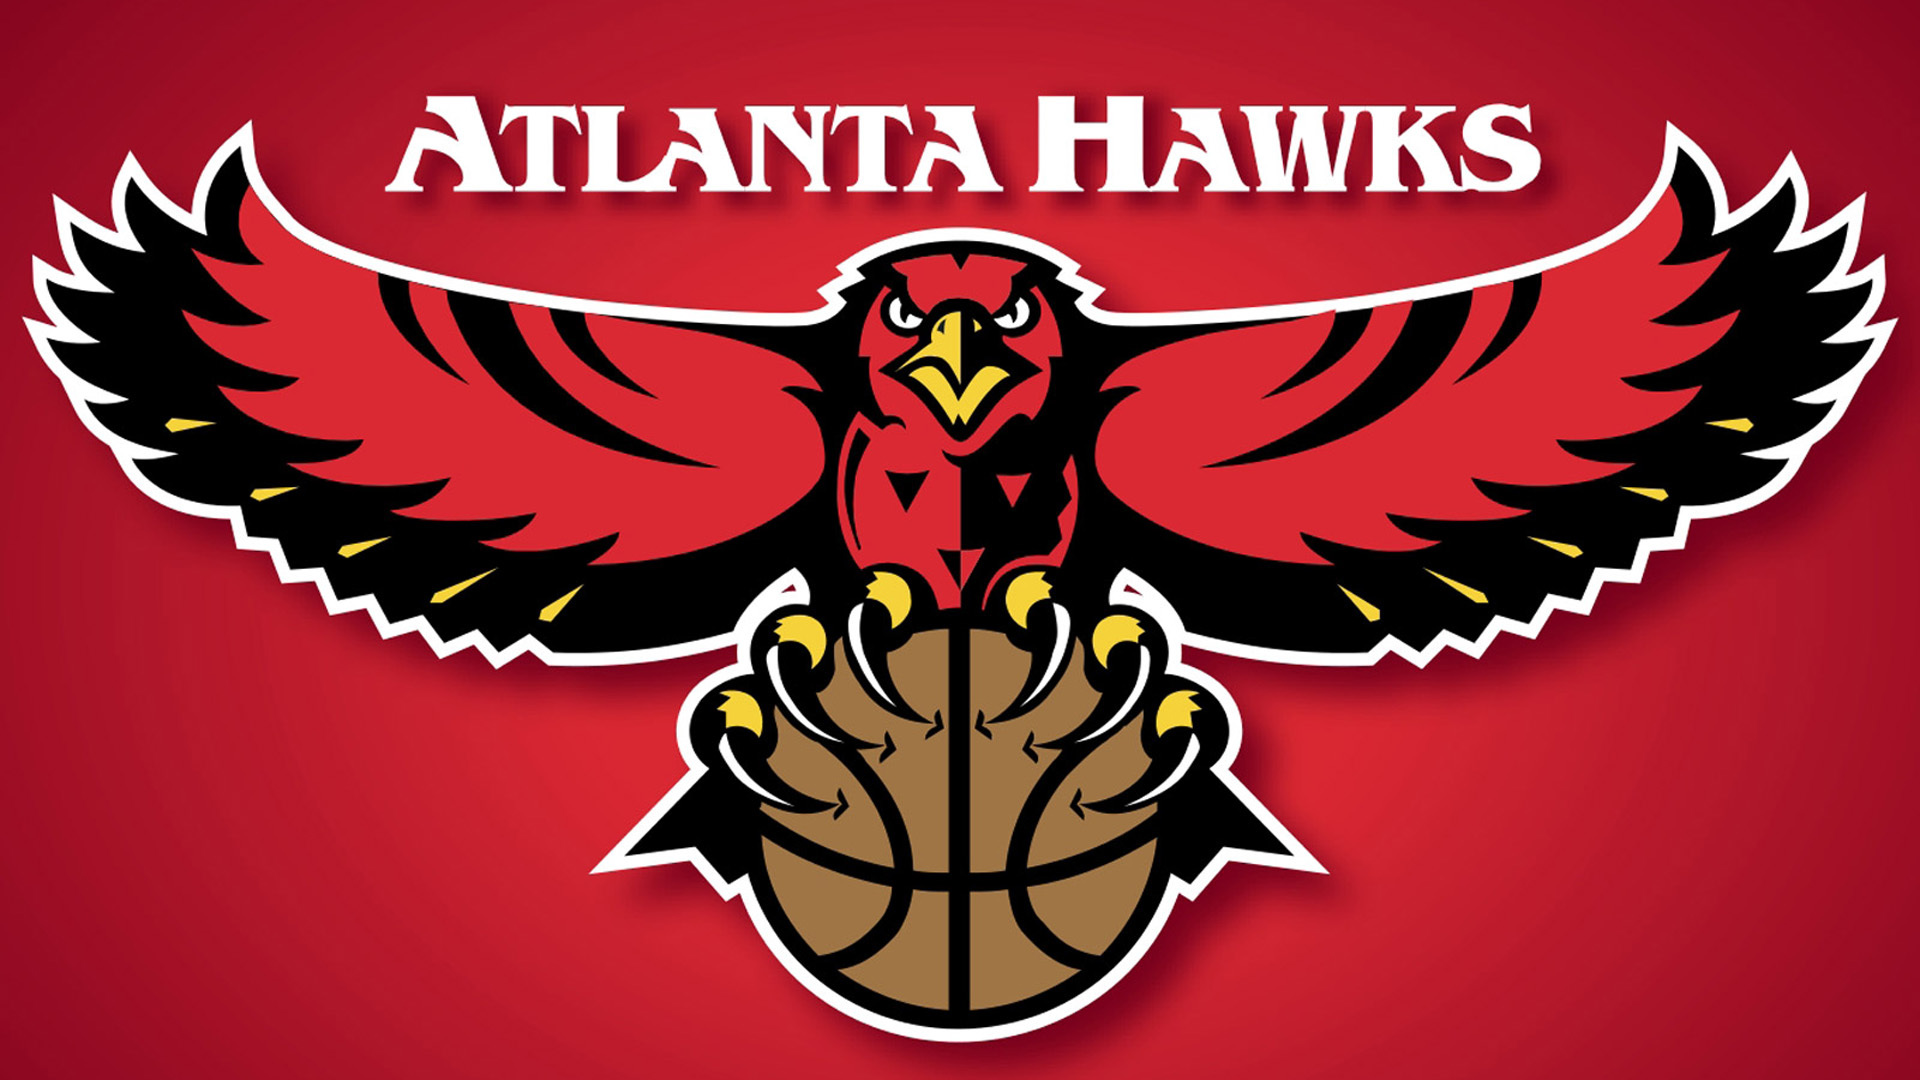 Atlanta Hawks High Quality Wallpapers